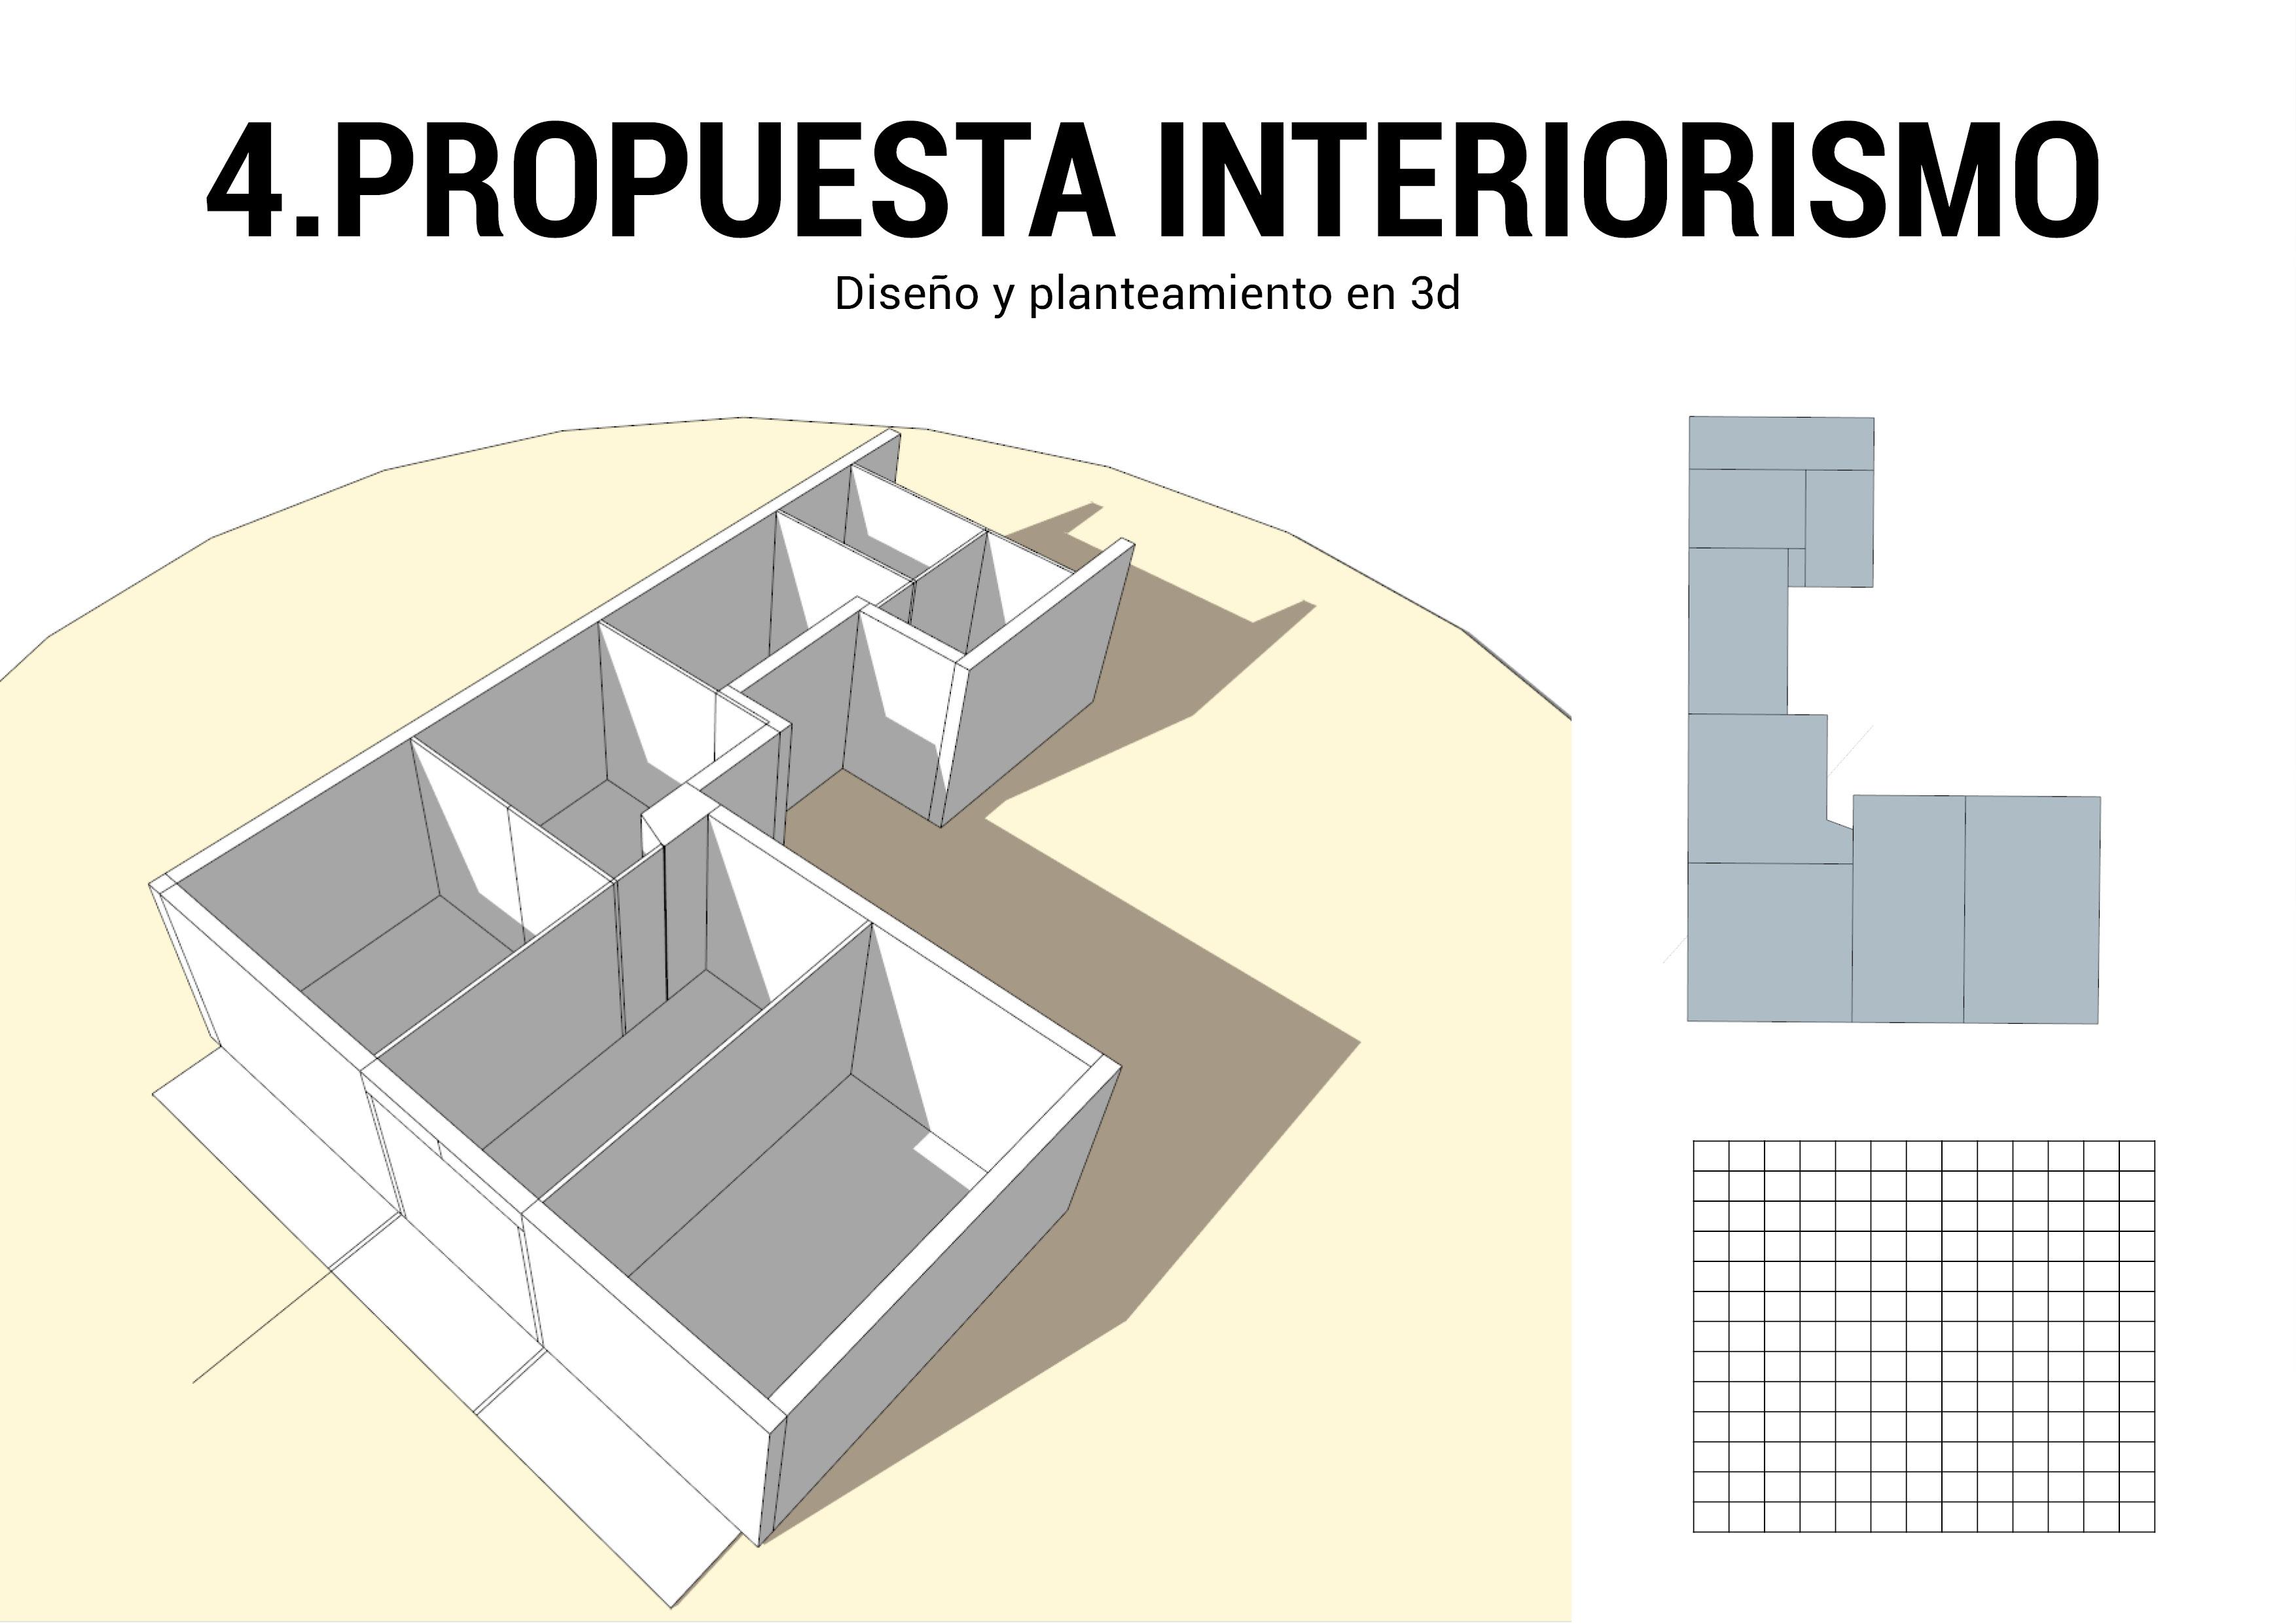 PROPUESTA-INTERIORISMO-CHESTE-26